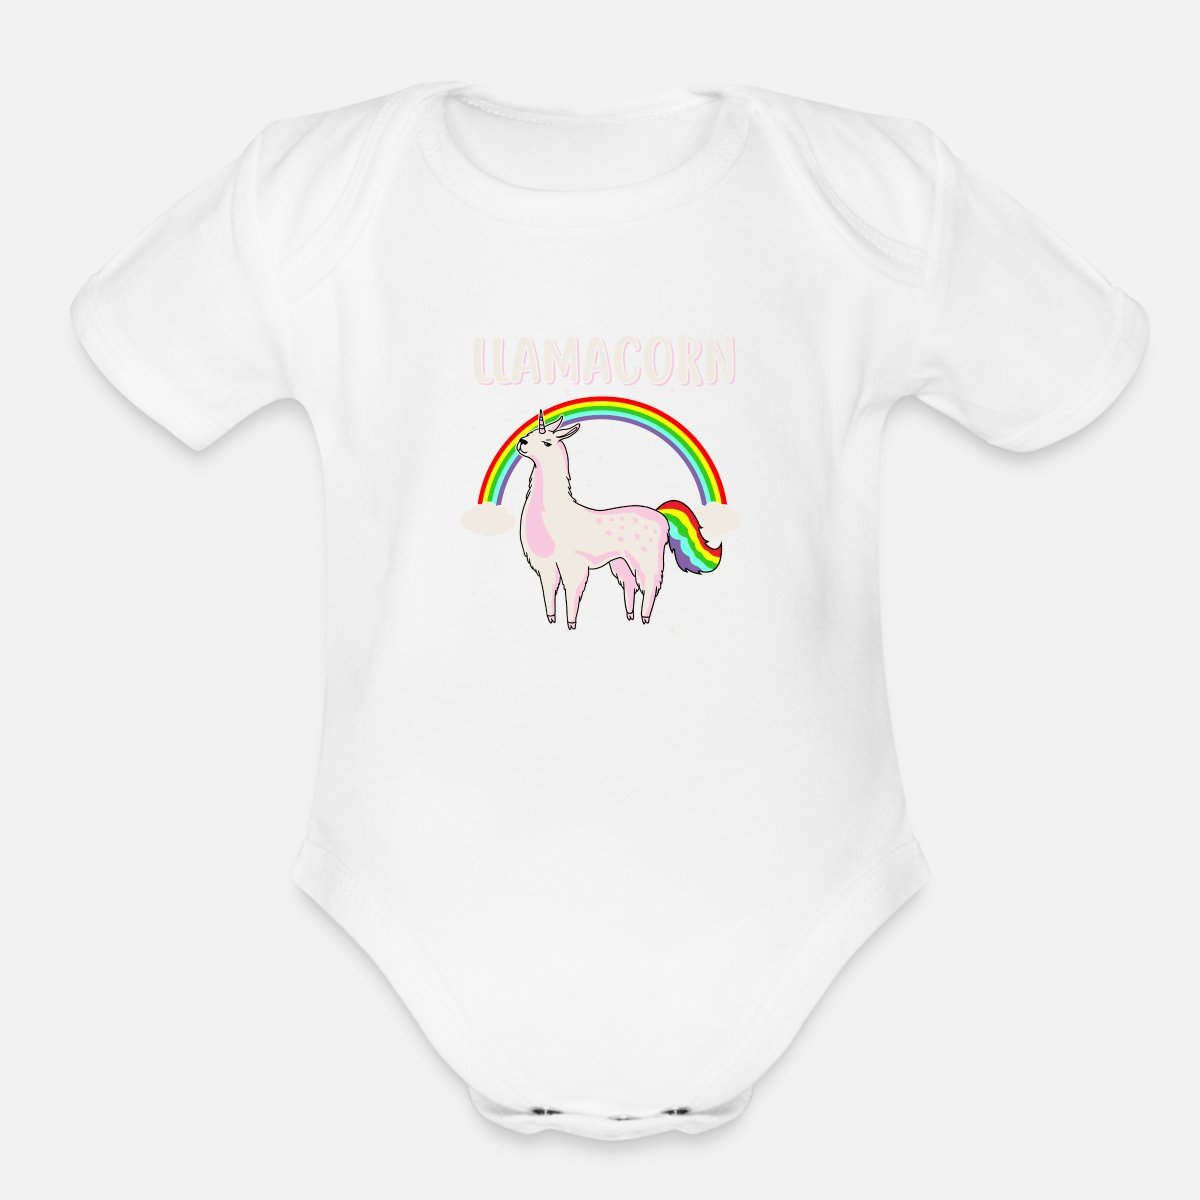 Toddler Unicorn Llama = Llamacorn Funny Gift Onesies Bodysuits